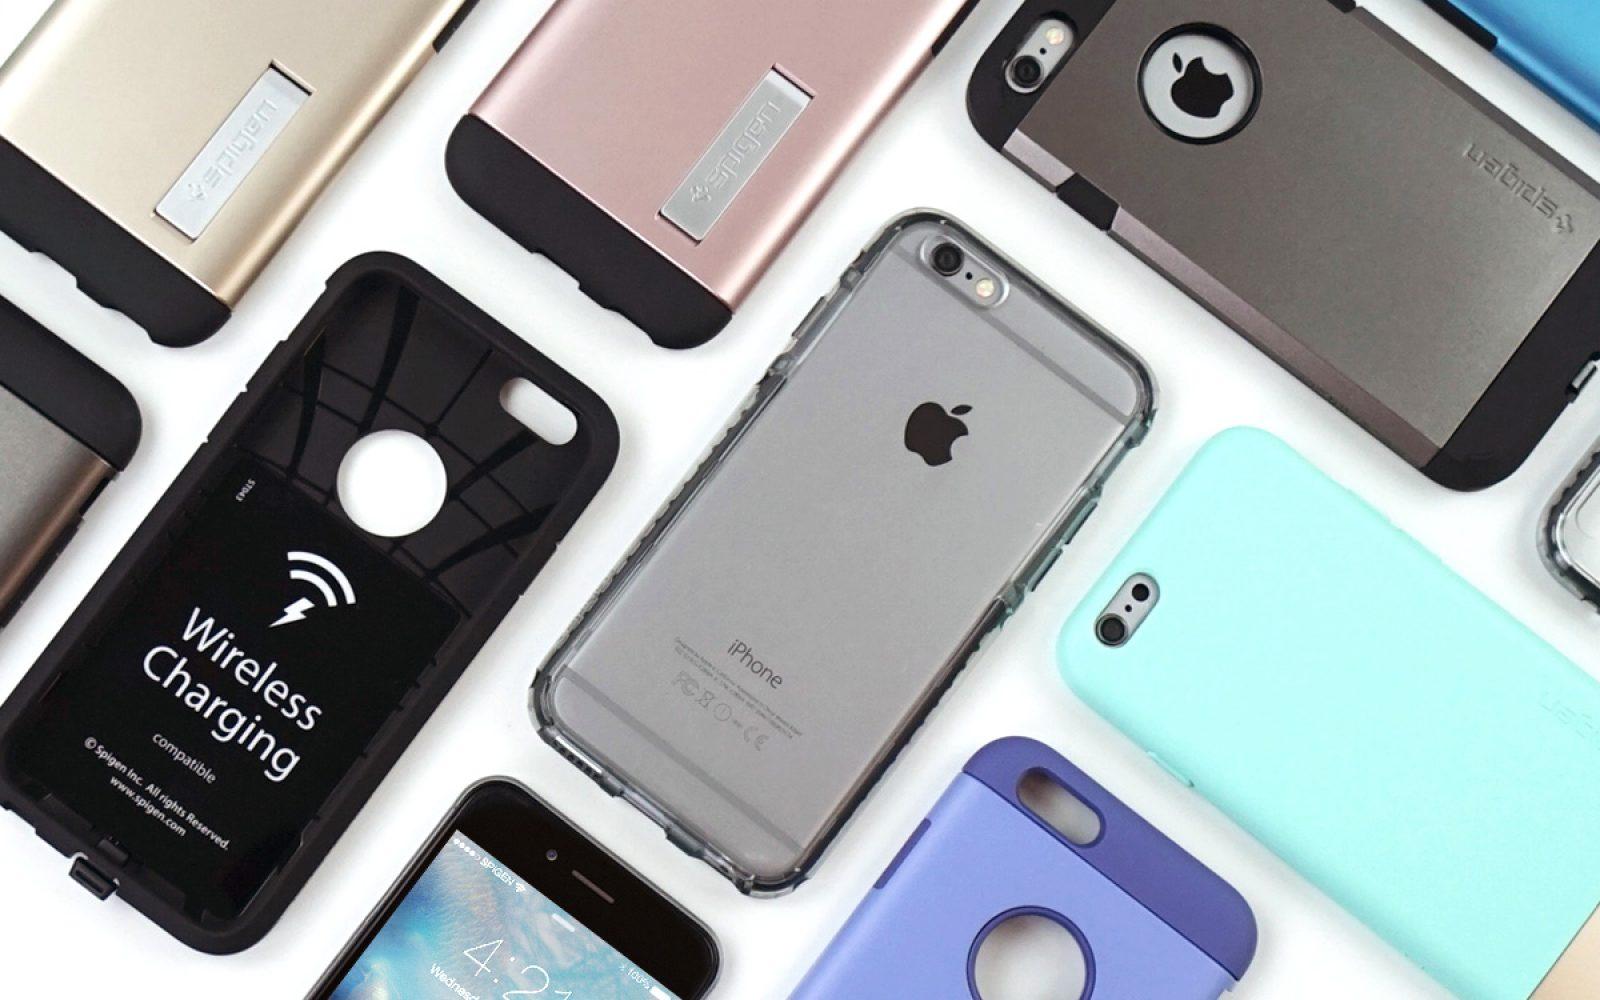 Spigen 9to5mac Ps4 Birthdays The Beginning Reg 2 Spigens Newest Iphone 6s Plus Cases Start At 999 Wireless Charging Case Only 2999